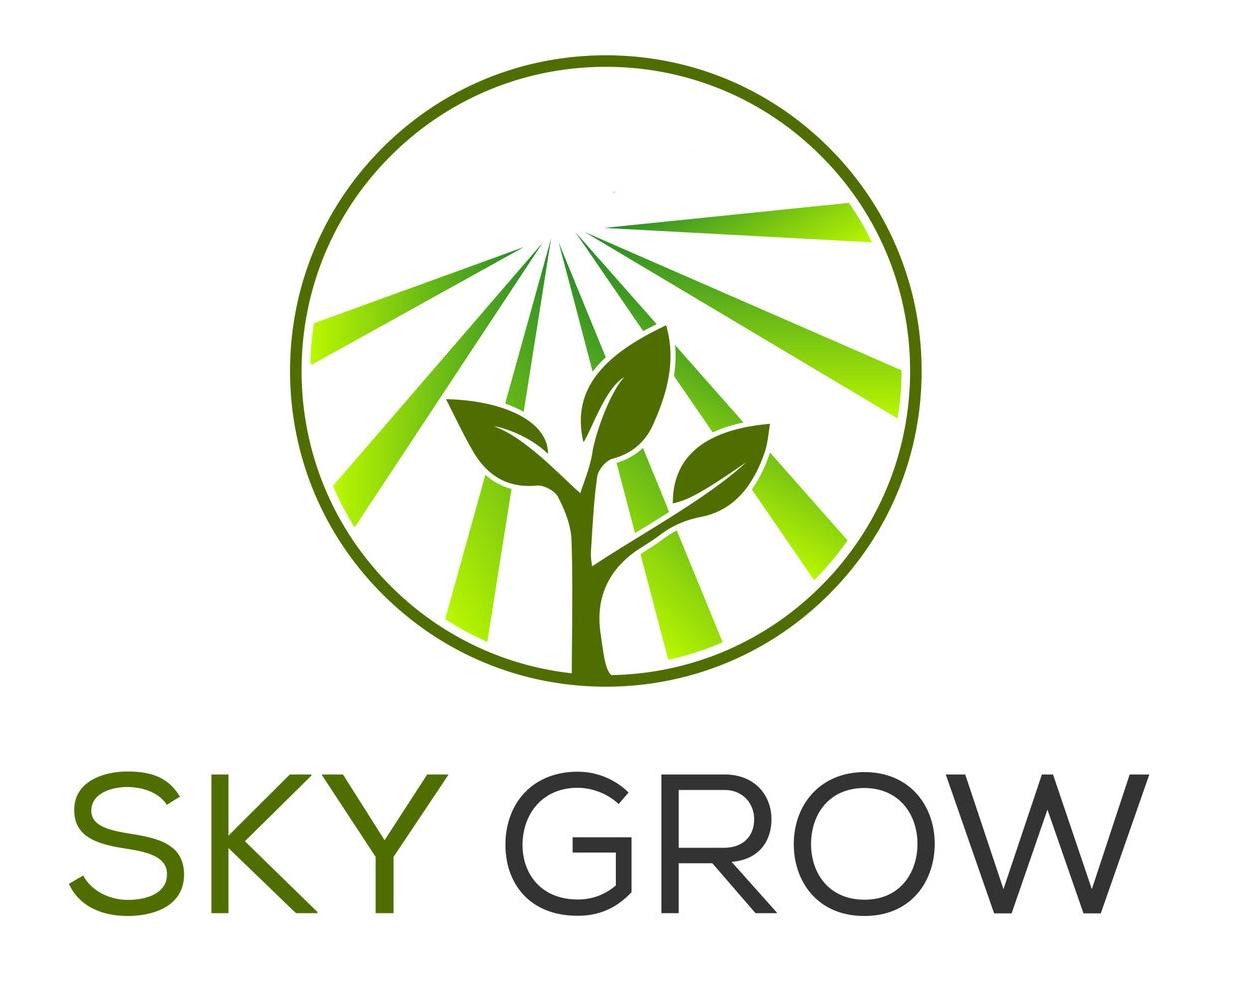 Sky_Grow Logo No Drone.jpg